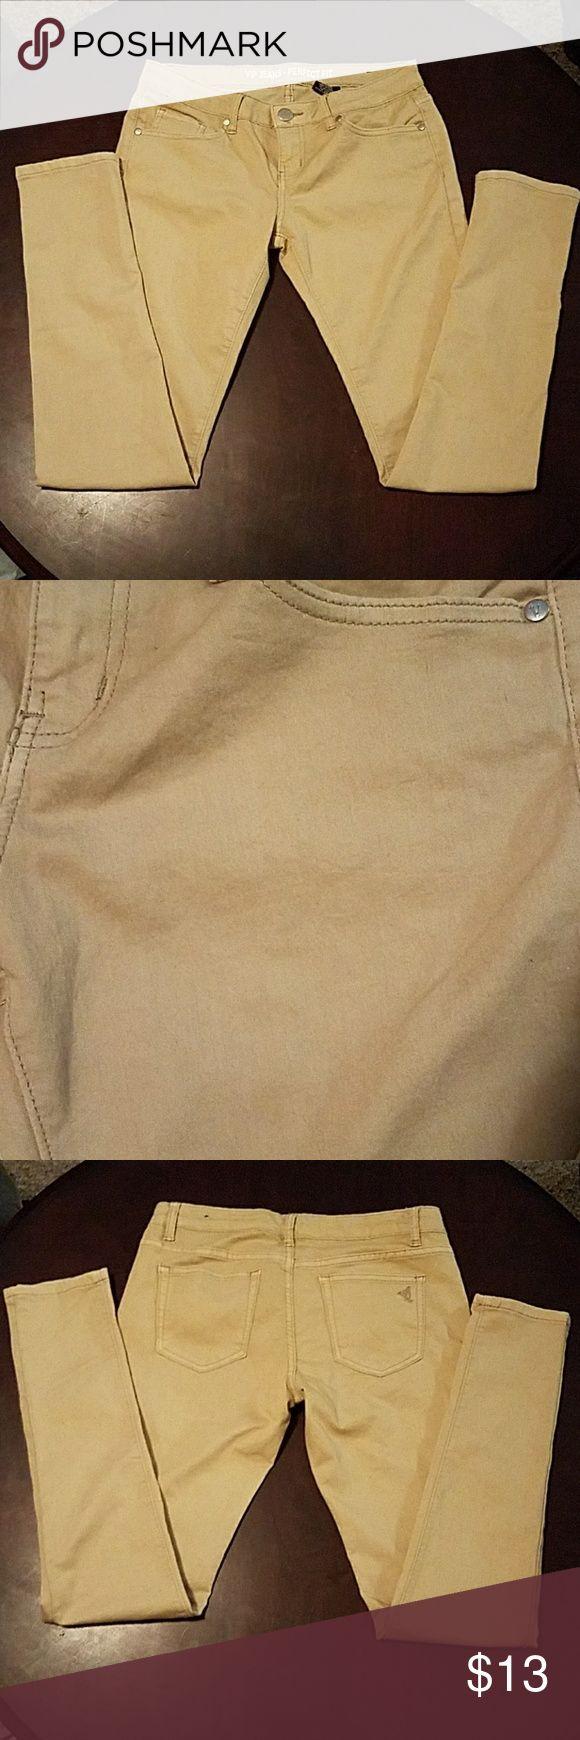 New Tan skinny jeans New Tan skinny jeans Jeans Skinny